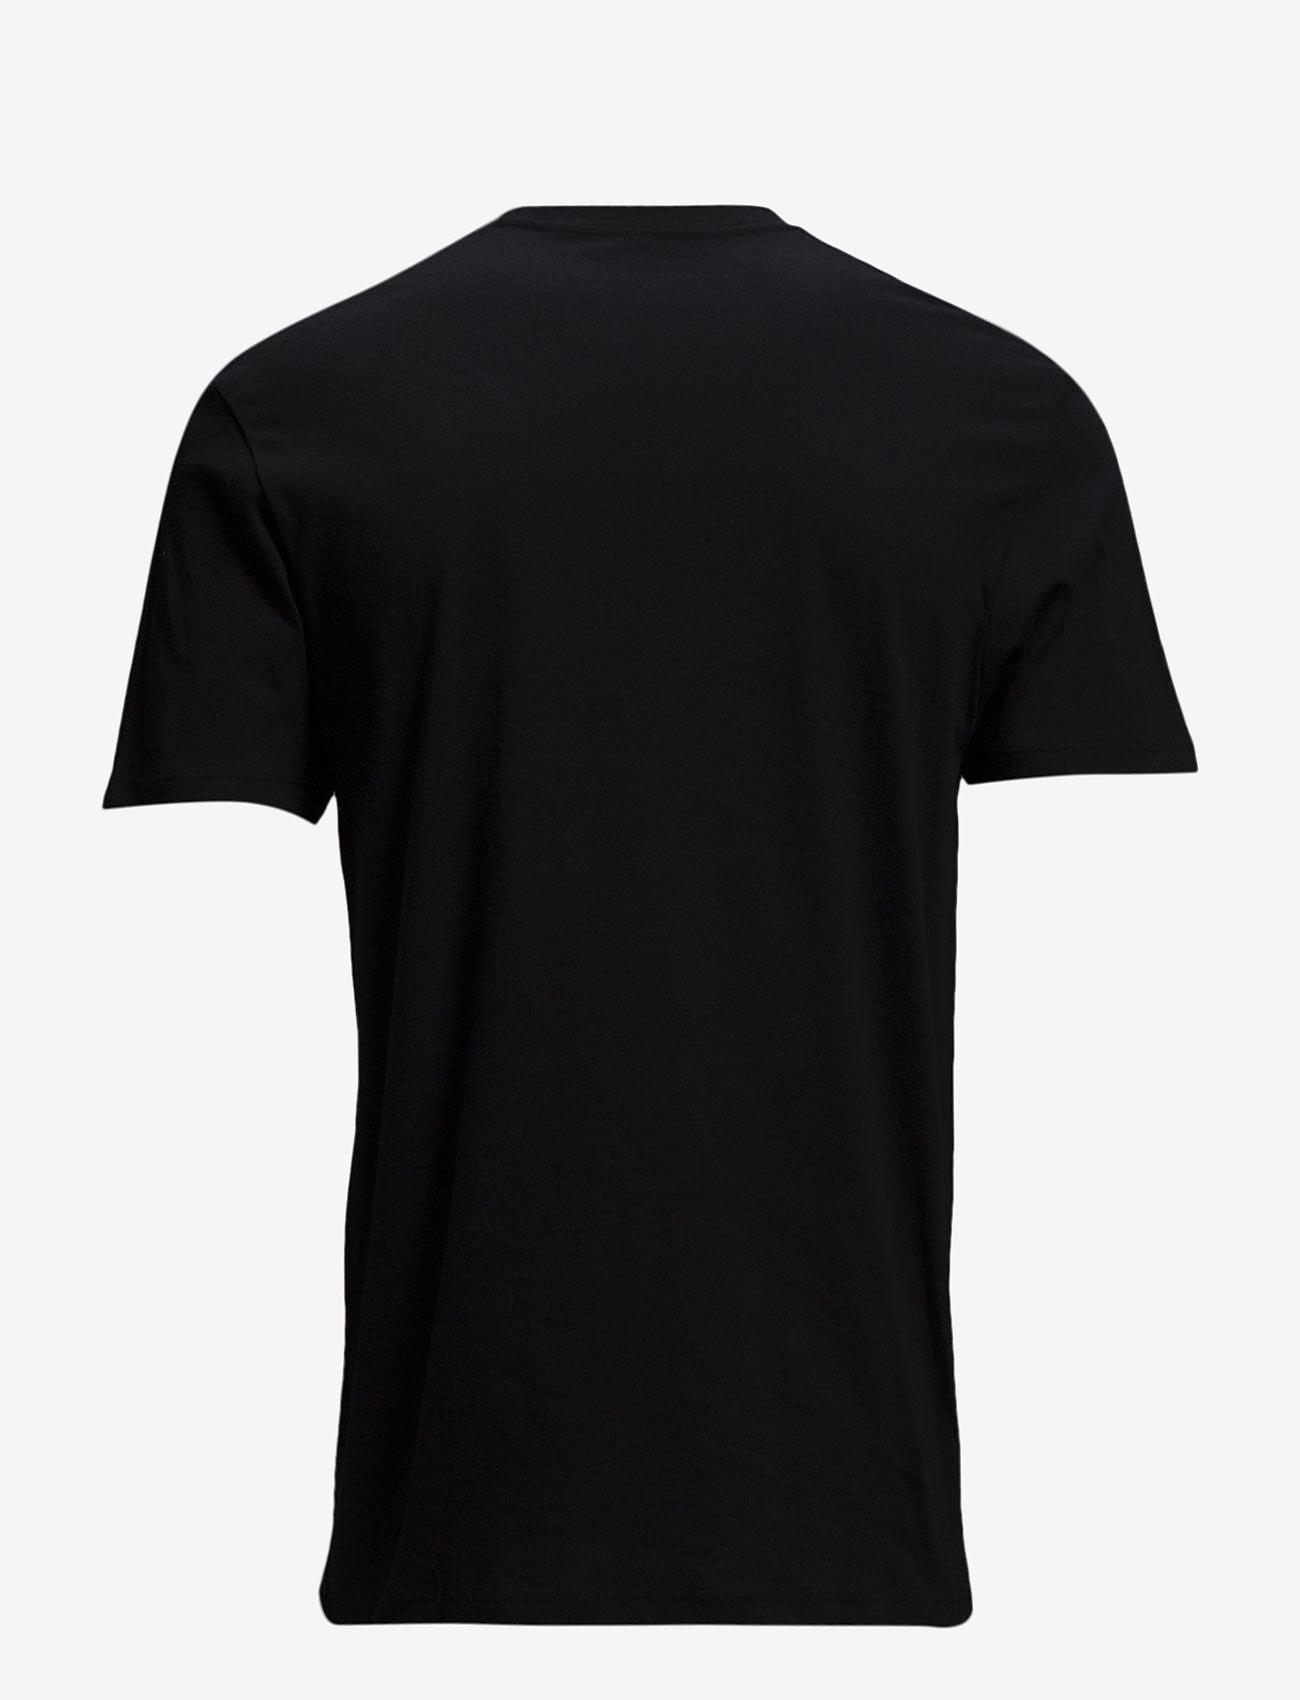 VANS - VANS CLASSIC - sports tops - black/white